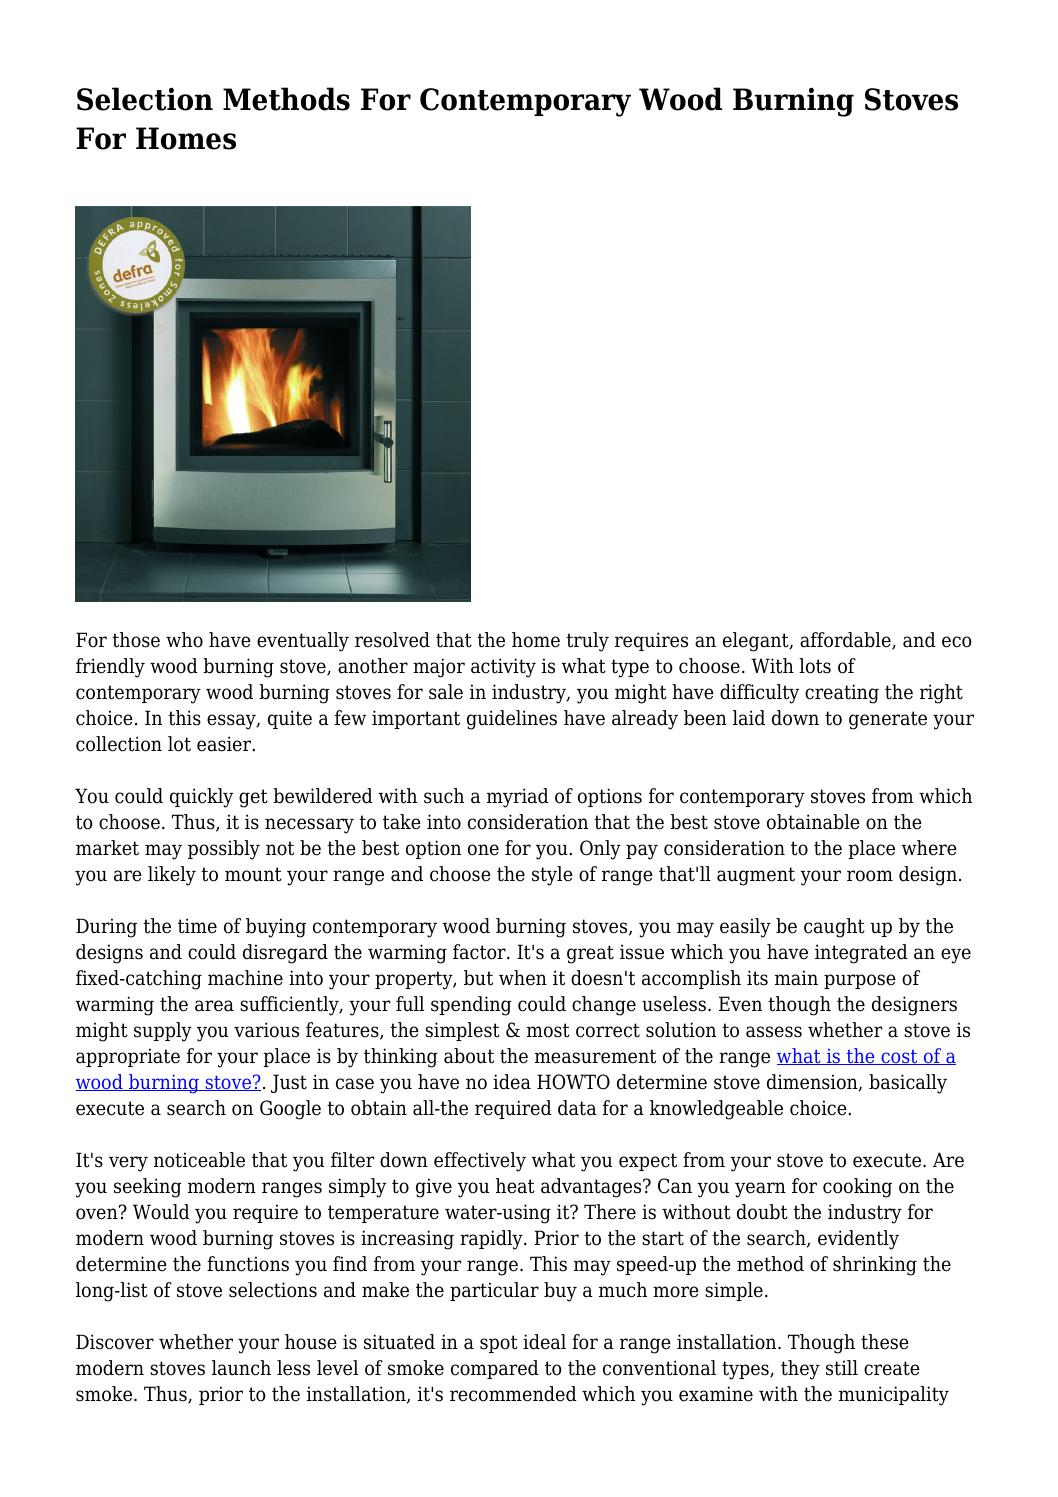 toulmin model essayflag burning essay   order cheap essay service target essays for toulmin model assignment  essay